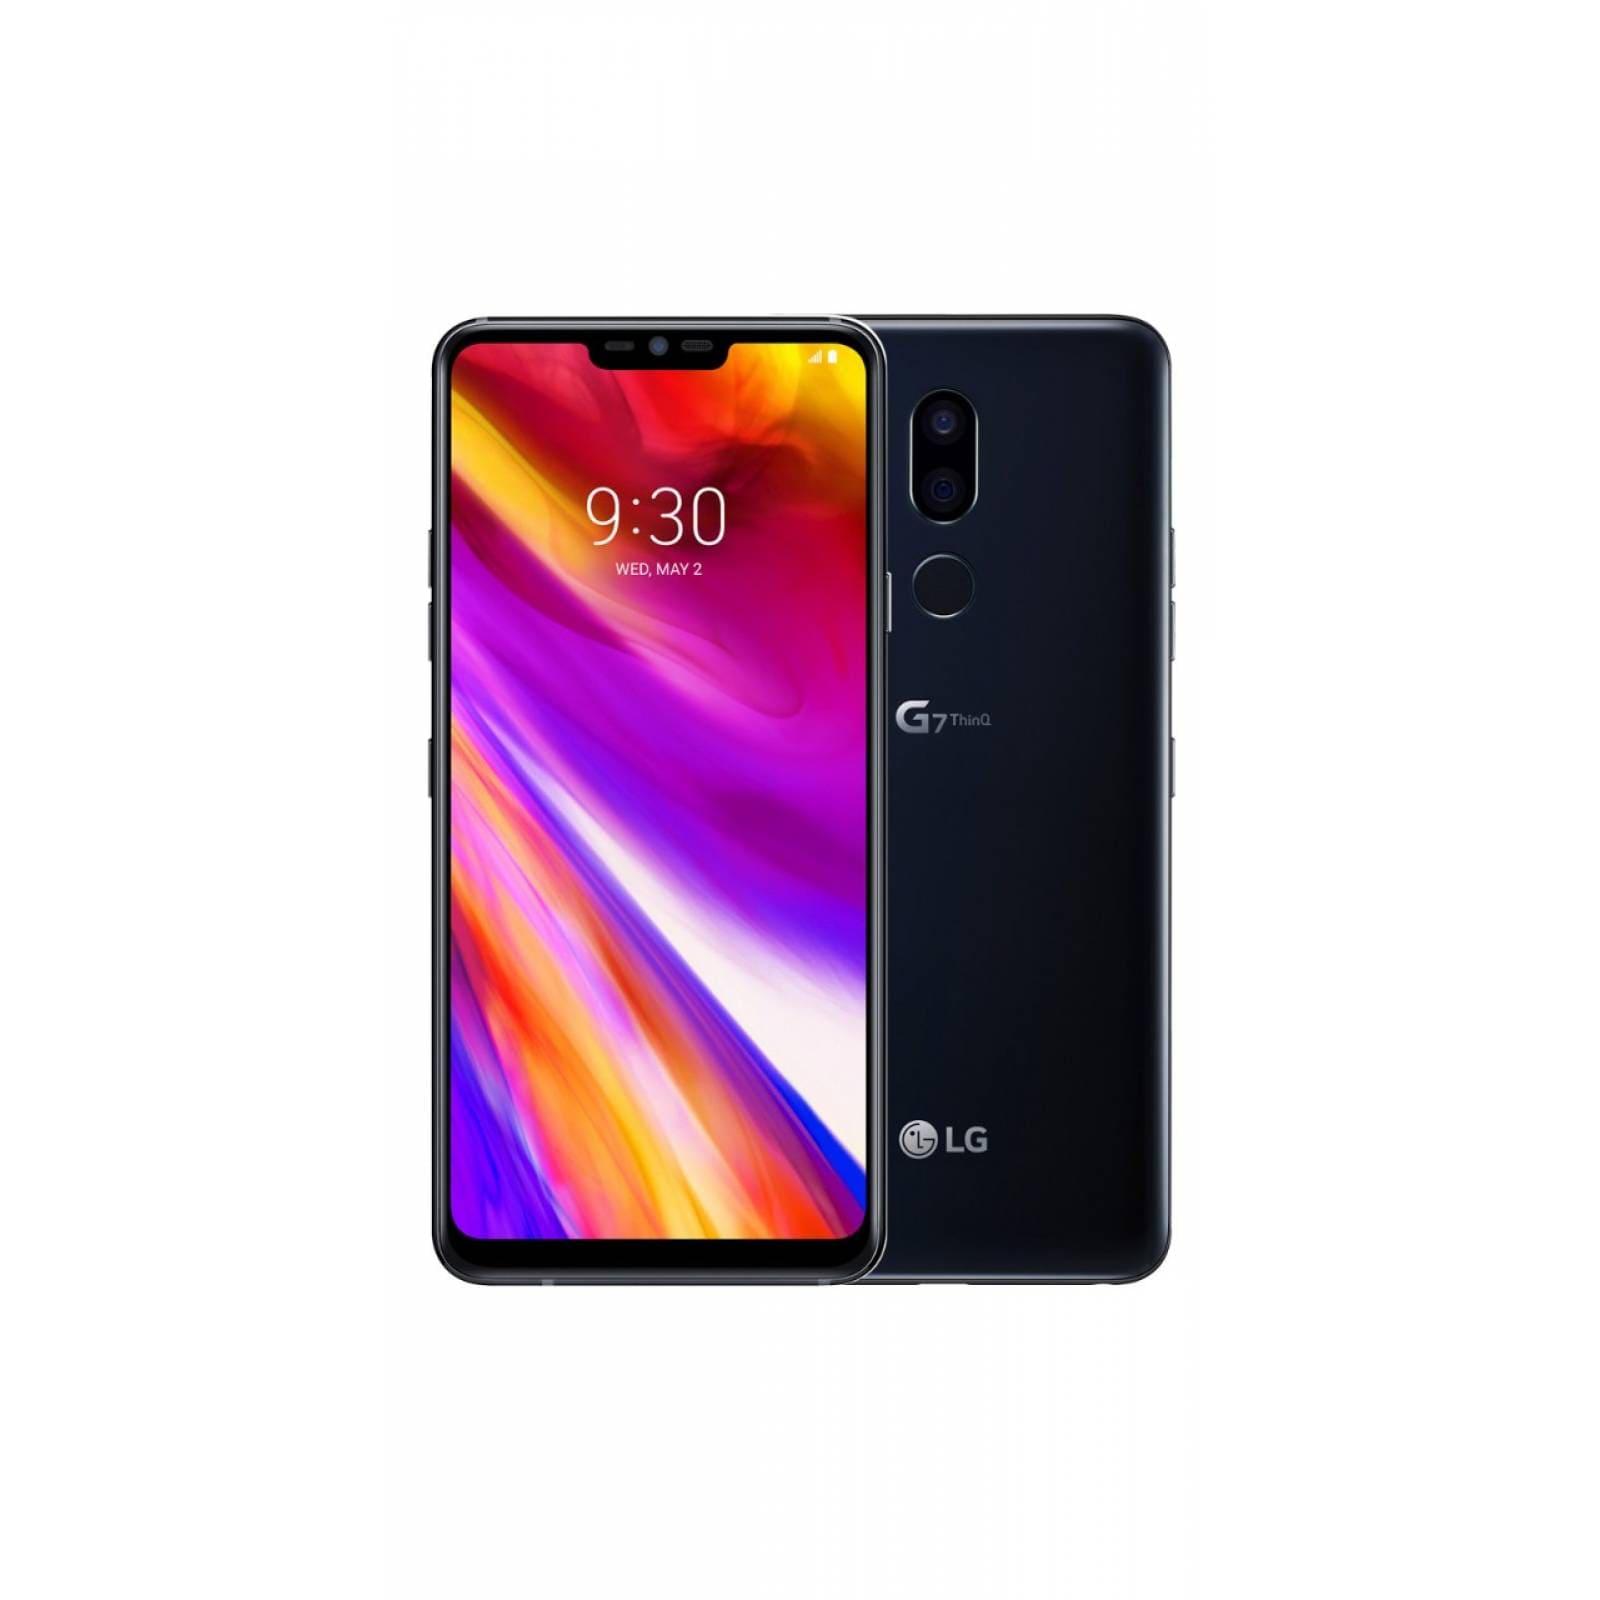 Celular LG LTE LM-G710AWM G7 THINQ Color NEGRO Telcel